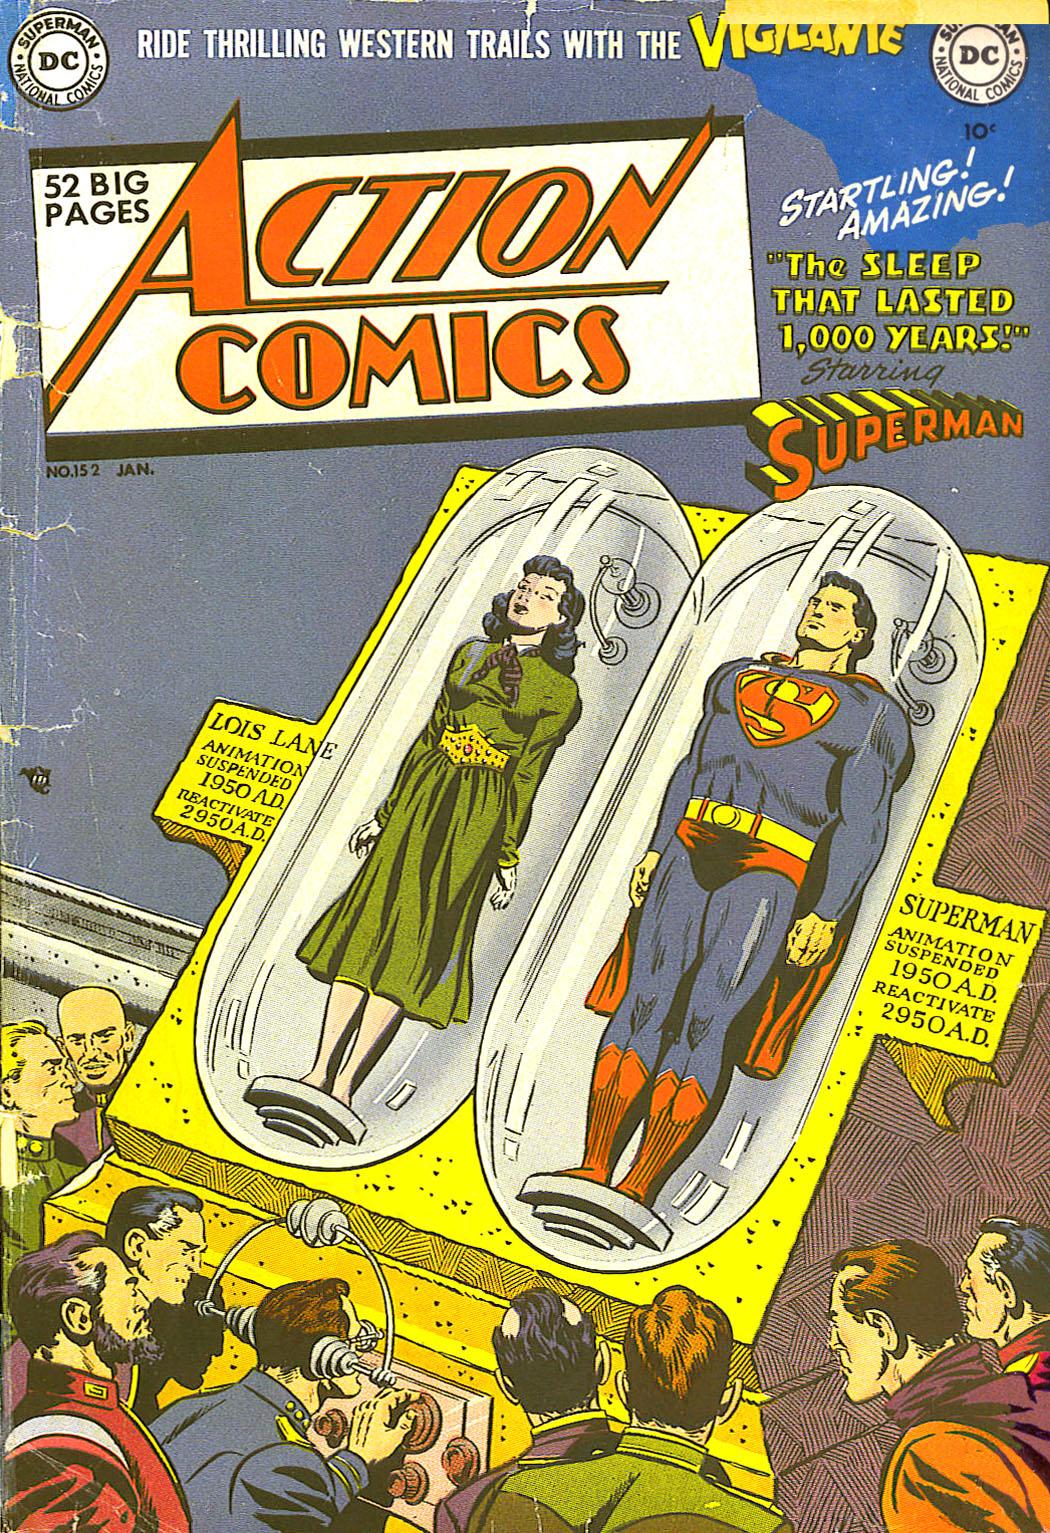 Action Comics (1938) 152 Page 1